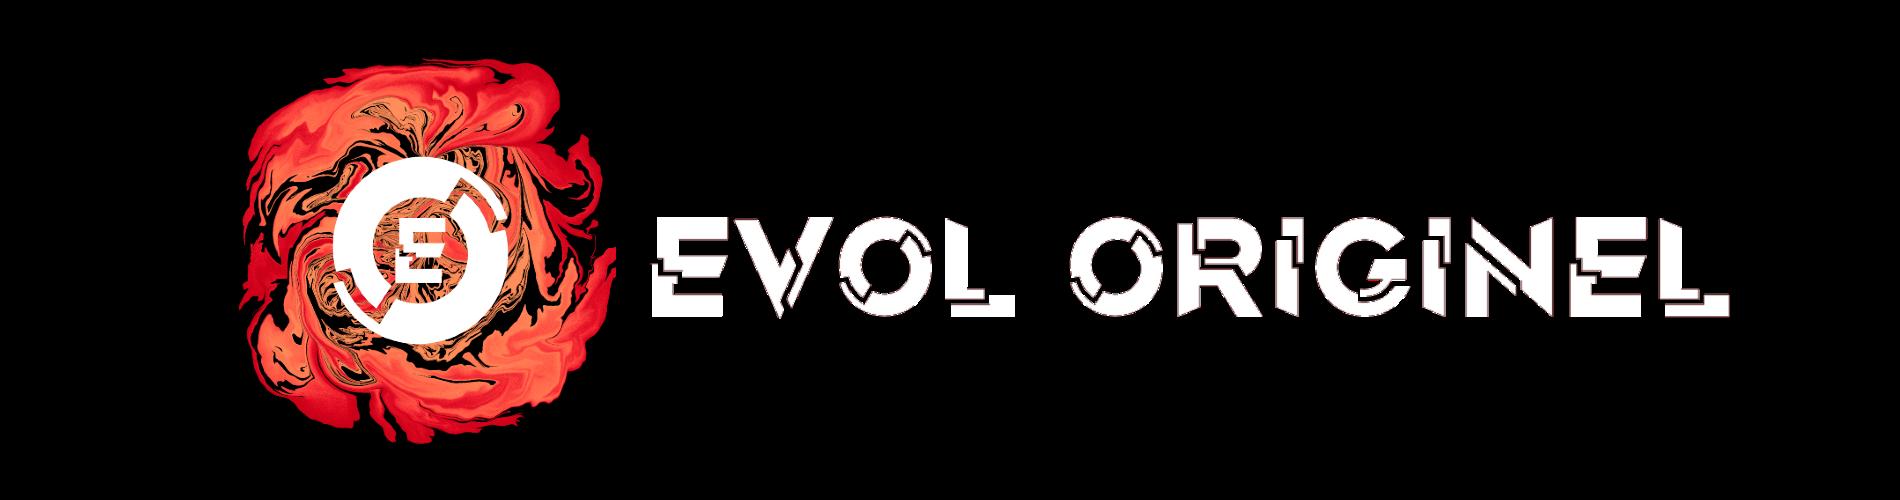 Evol Originel